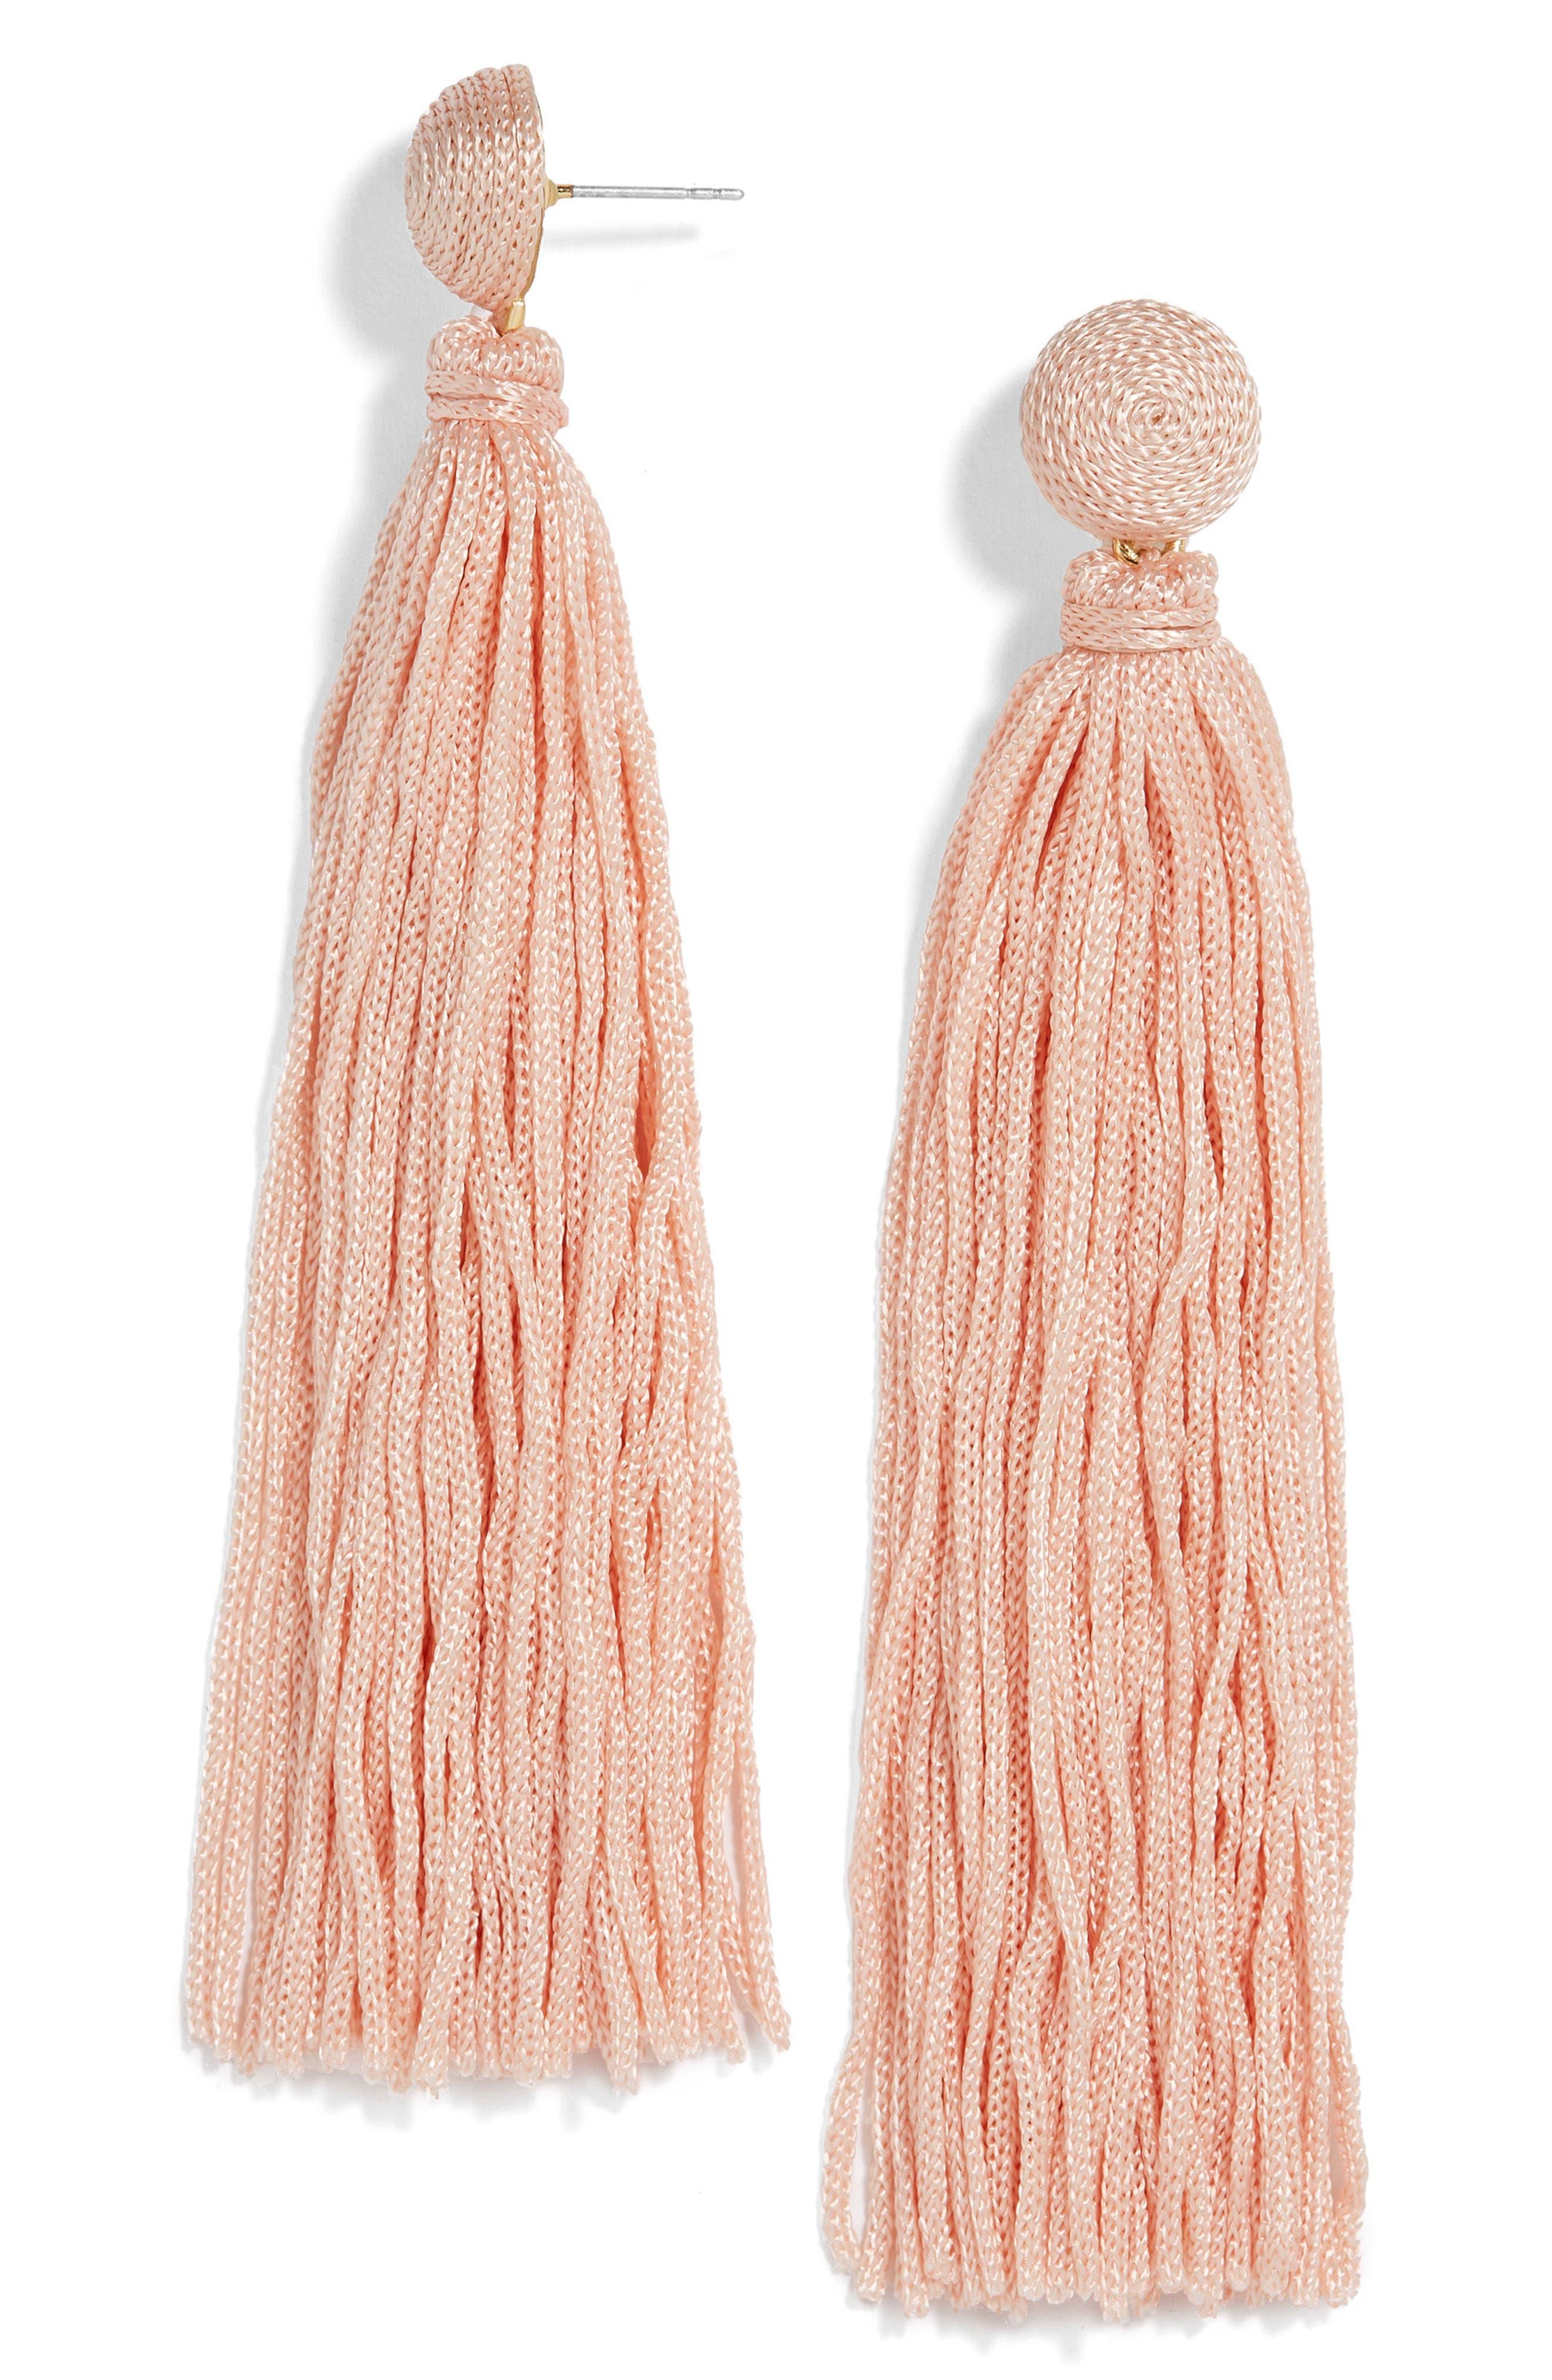 Valencia Shoulder Duster Tassel Earrings,                         Main,                         color, Blush